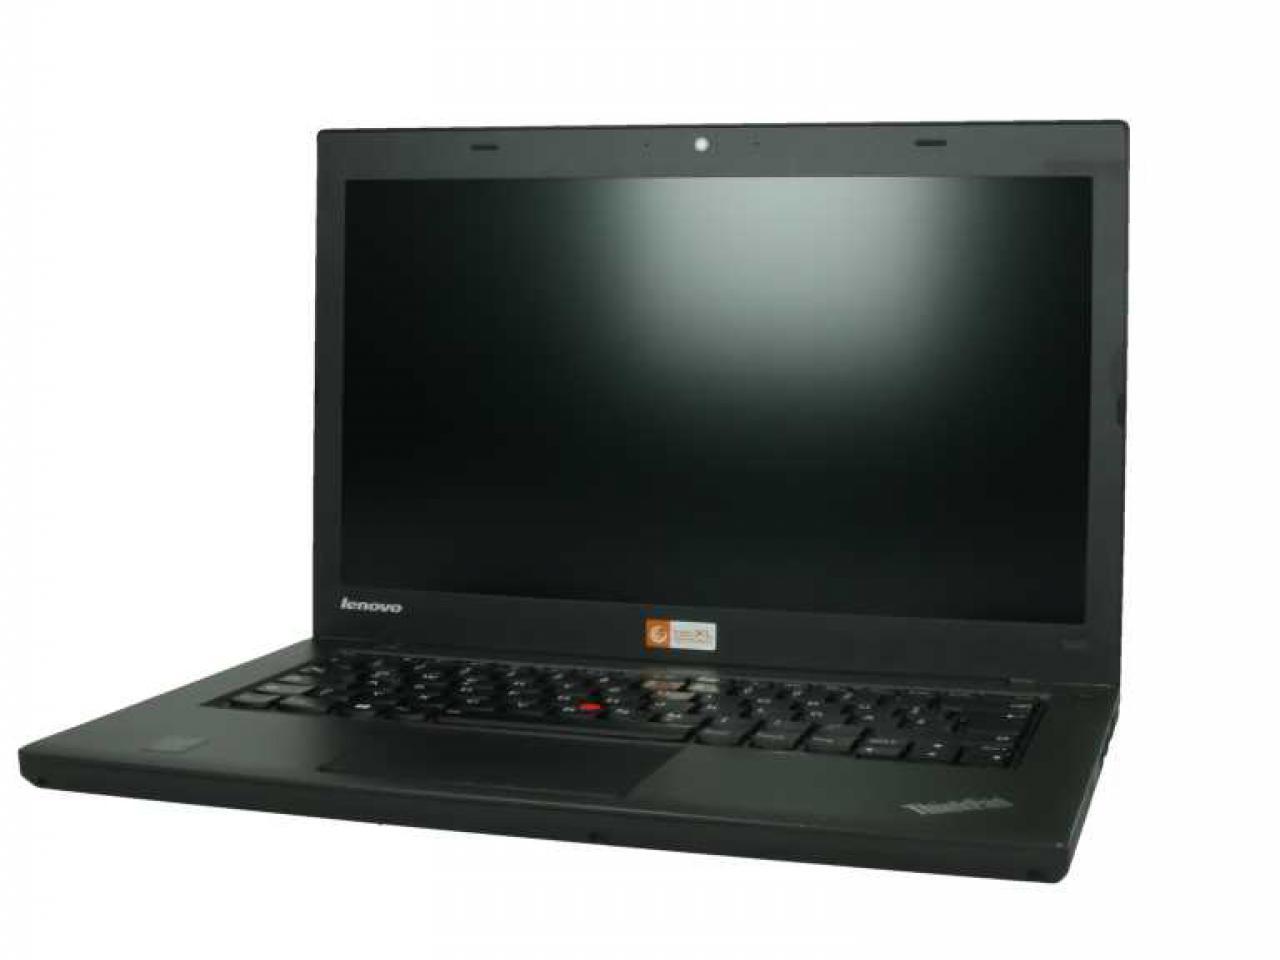 Lenovo ThinkPad T440  - shop.bb-net.de